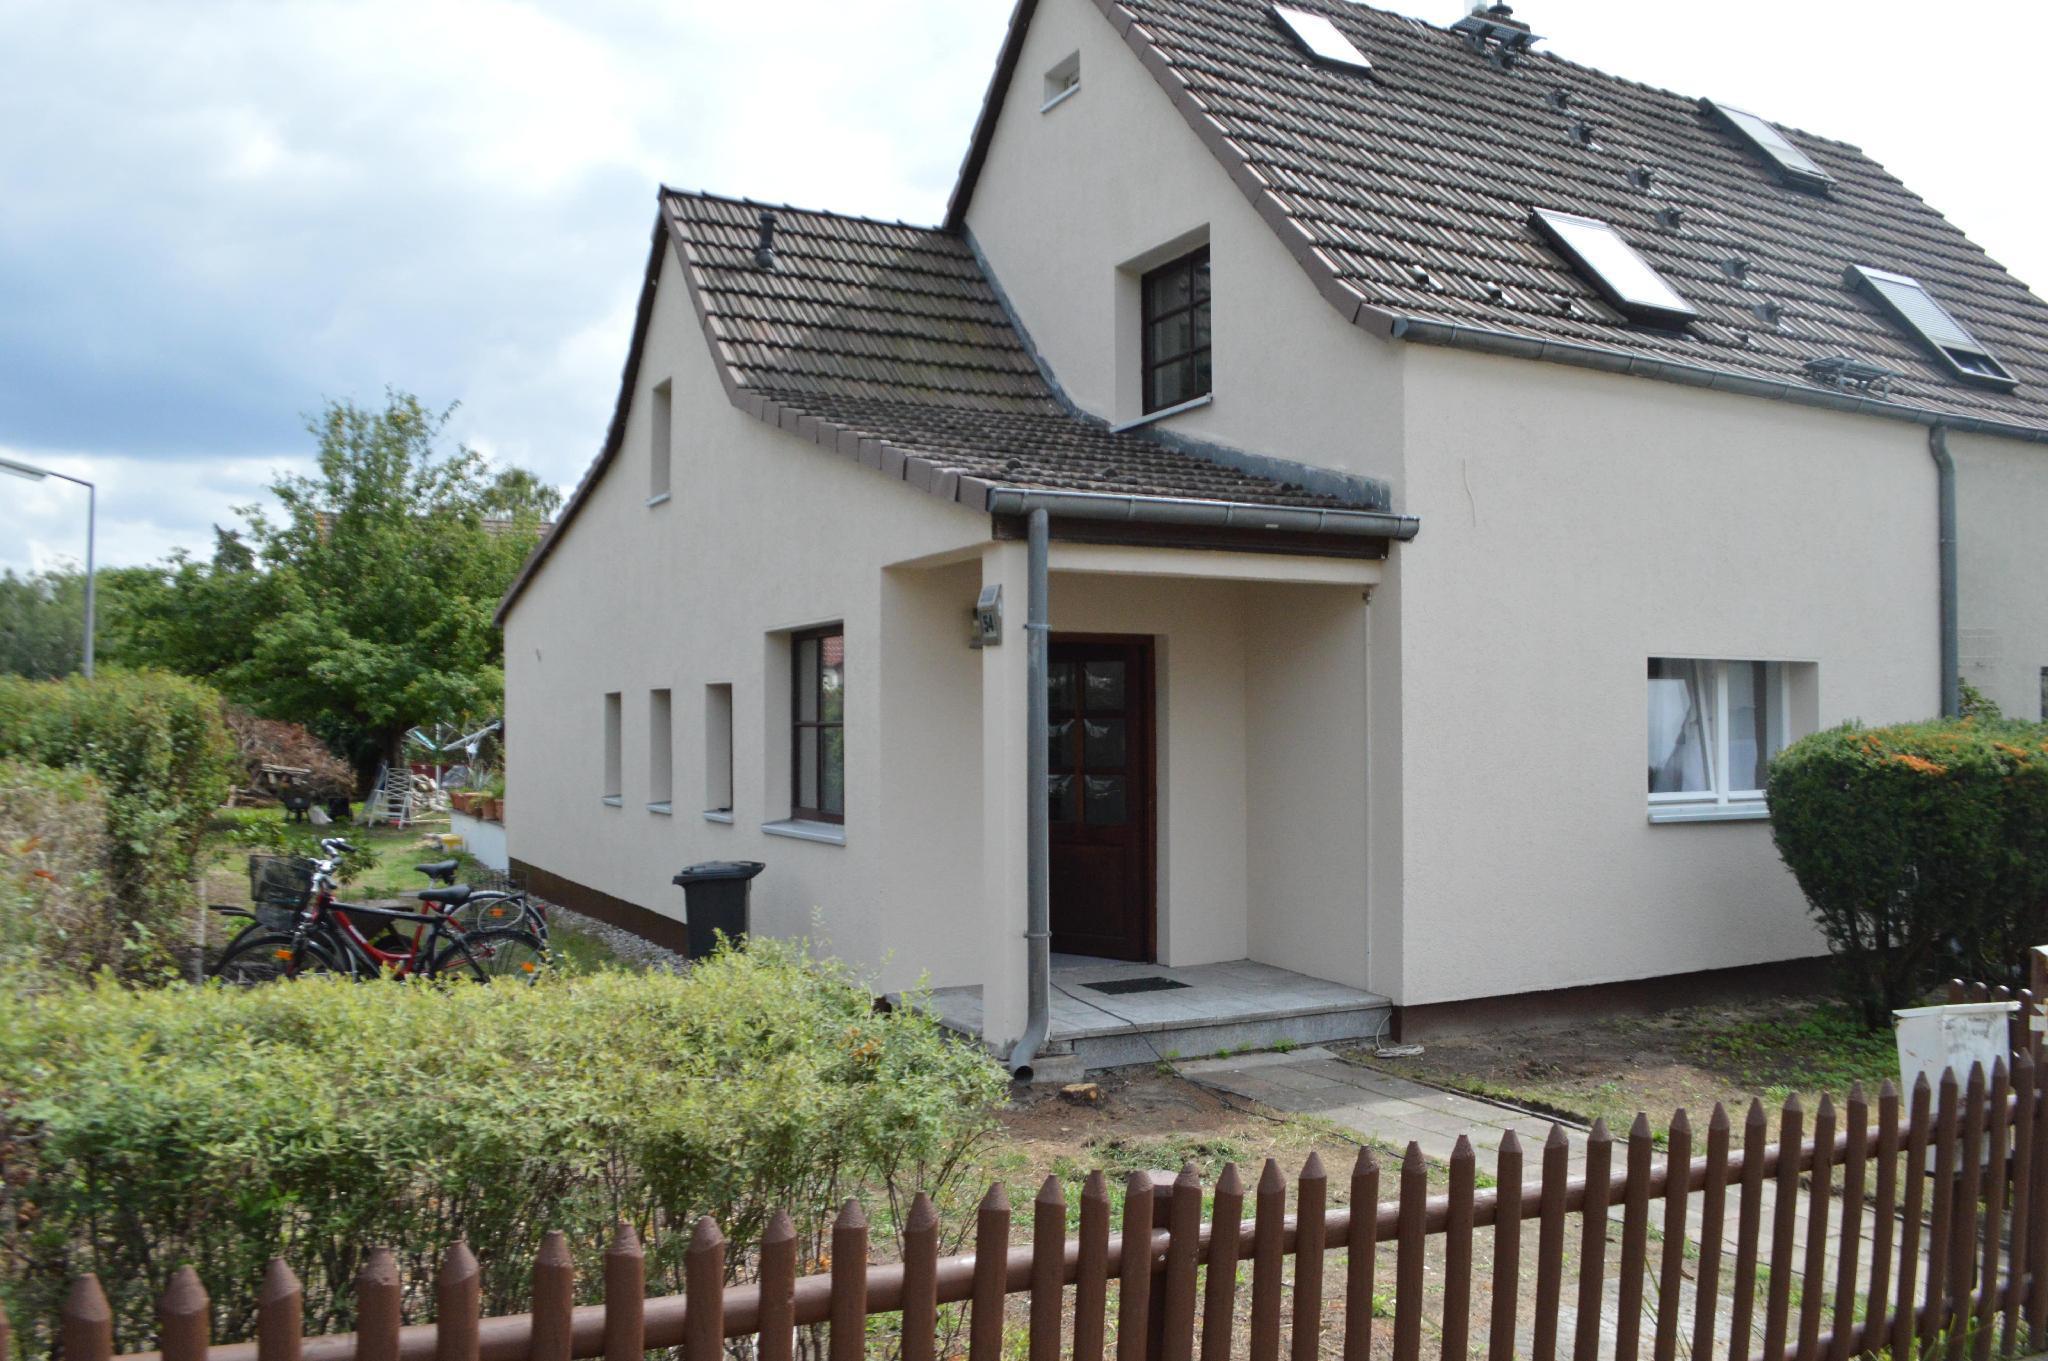 Furnished House With Big Garden Berlin Heiligensee